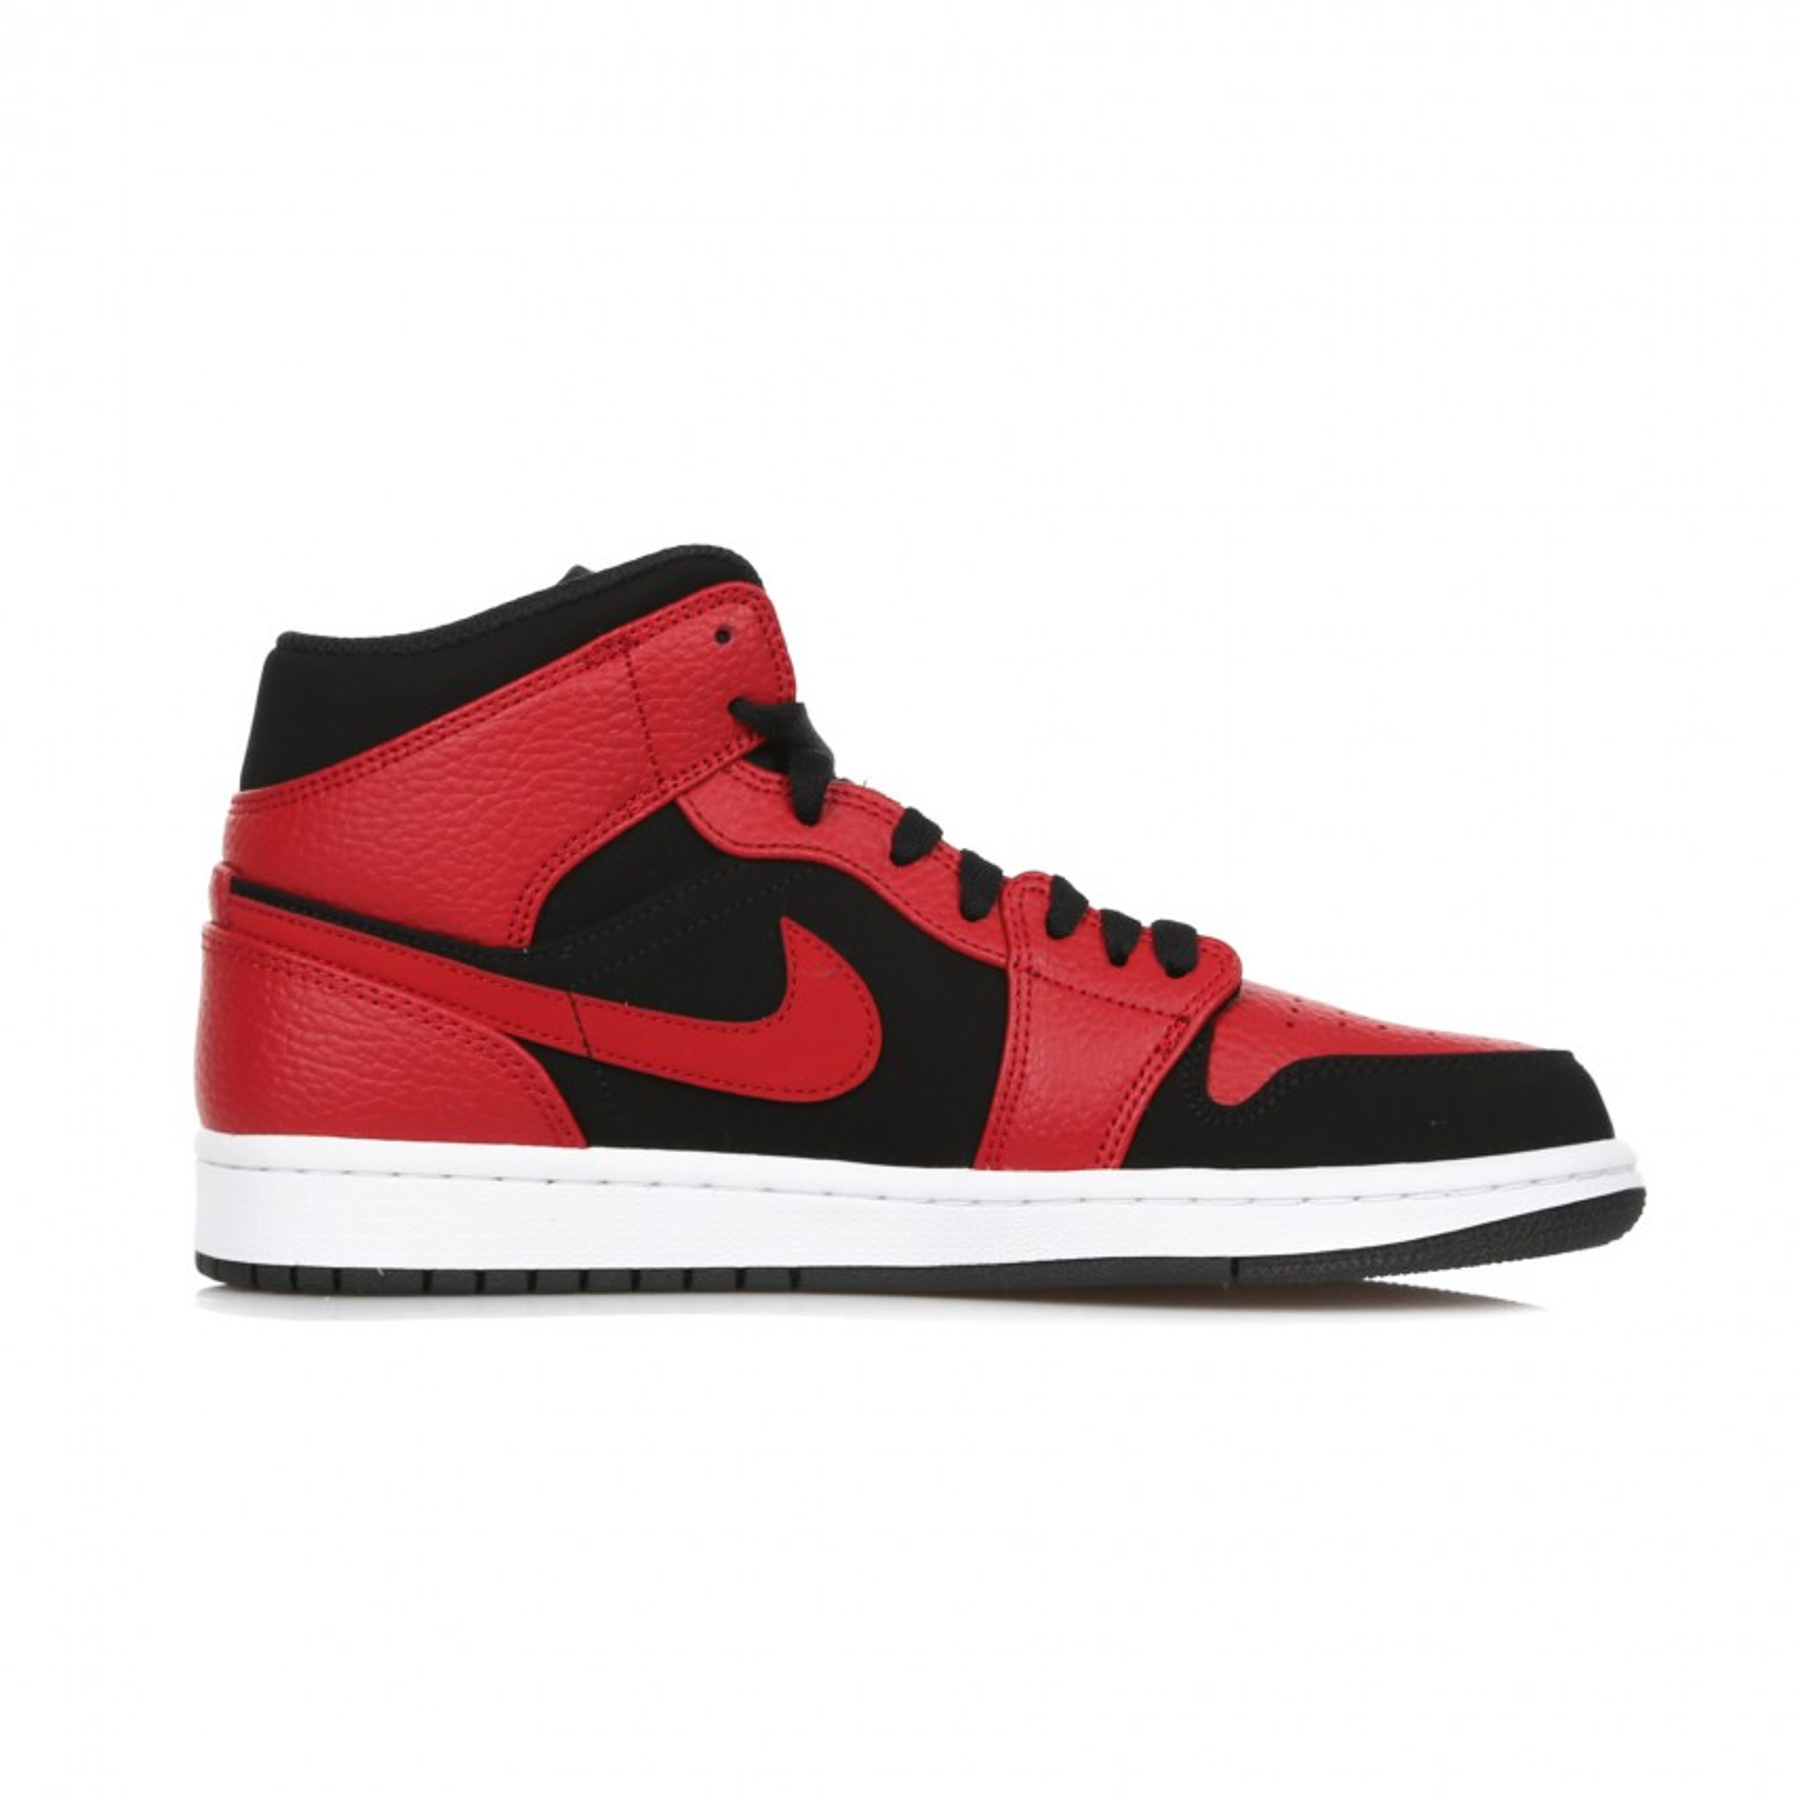 online store b9f56 a9eb6 SCARPA ALTA AIR JORDAN 1 MID BLACK/GYM RED/WHITE